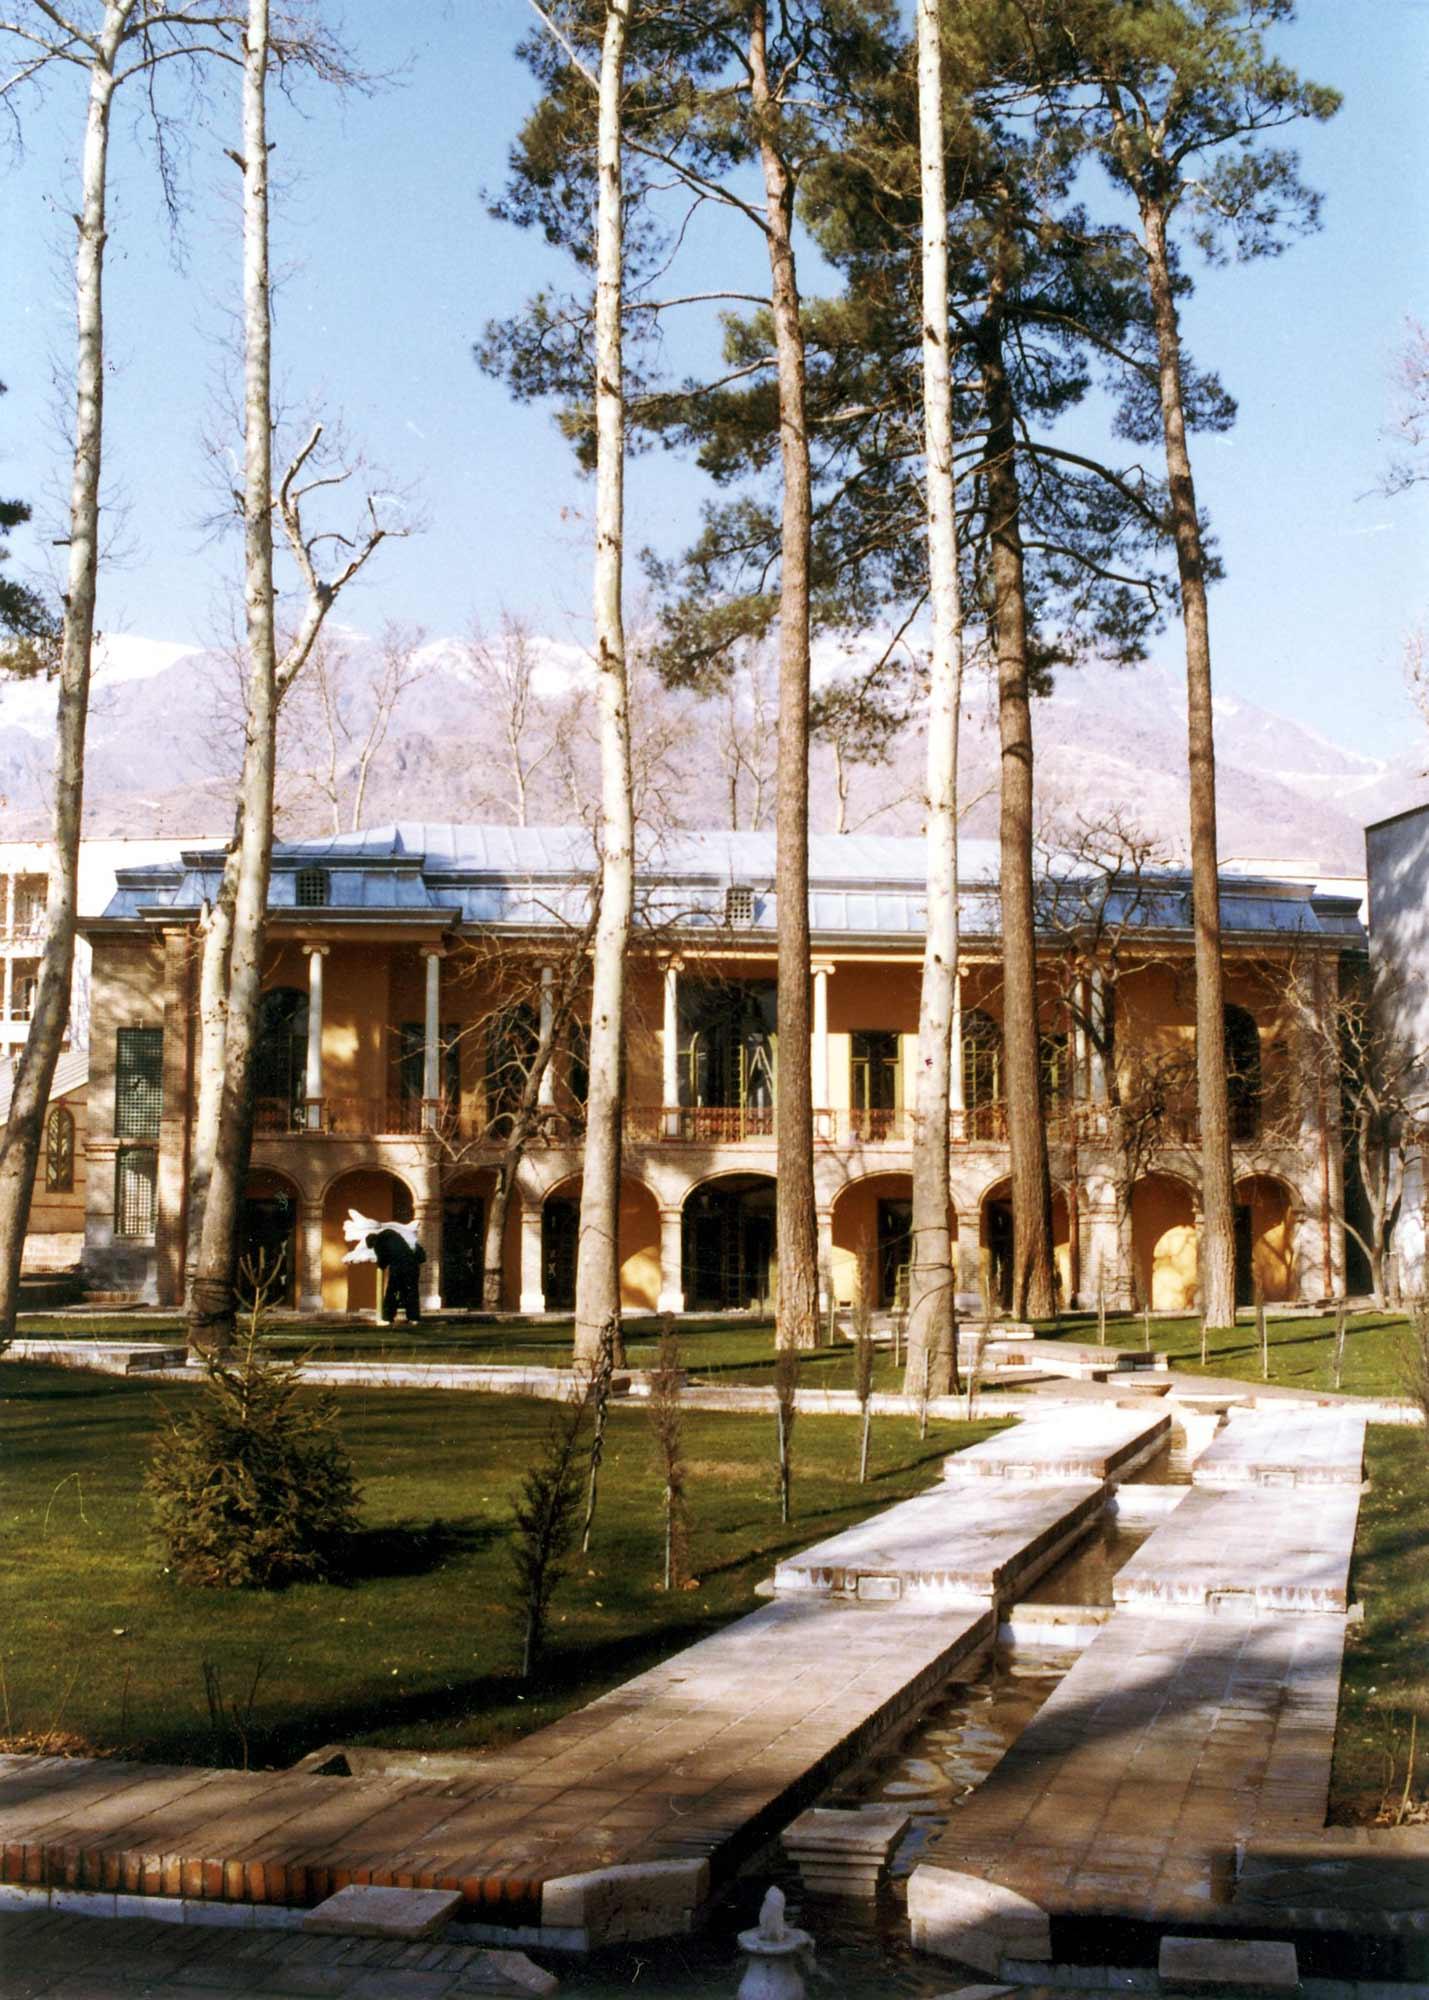 Iranian Calligraphers' Society